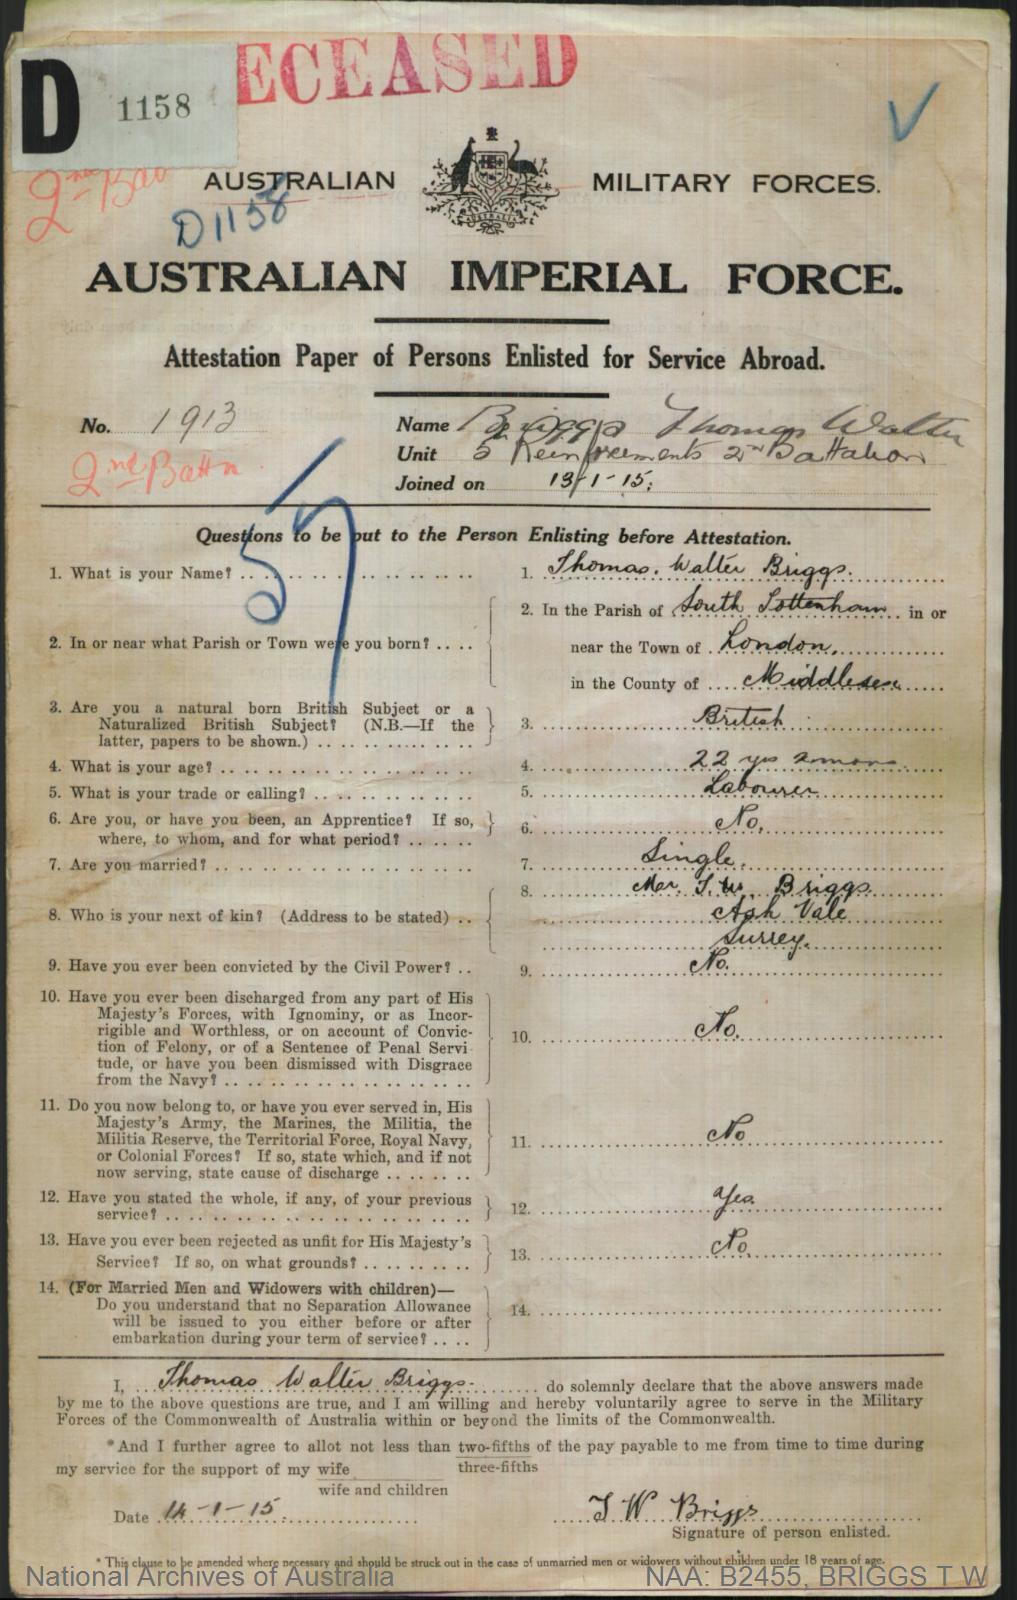 Briggs Thomas Walter : SERN 1913 : POB London England : POE Liverpool NSW : NOK F Briggs T W